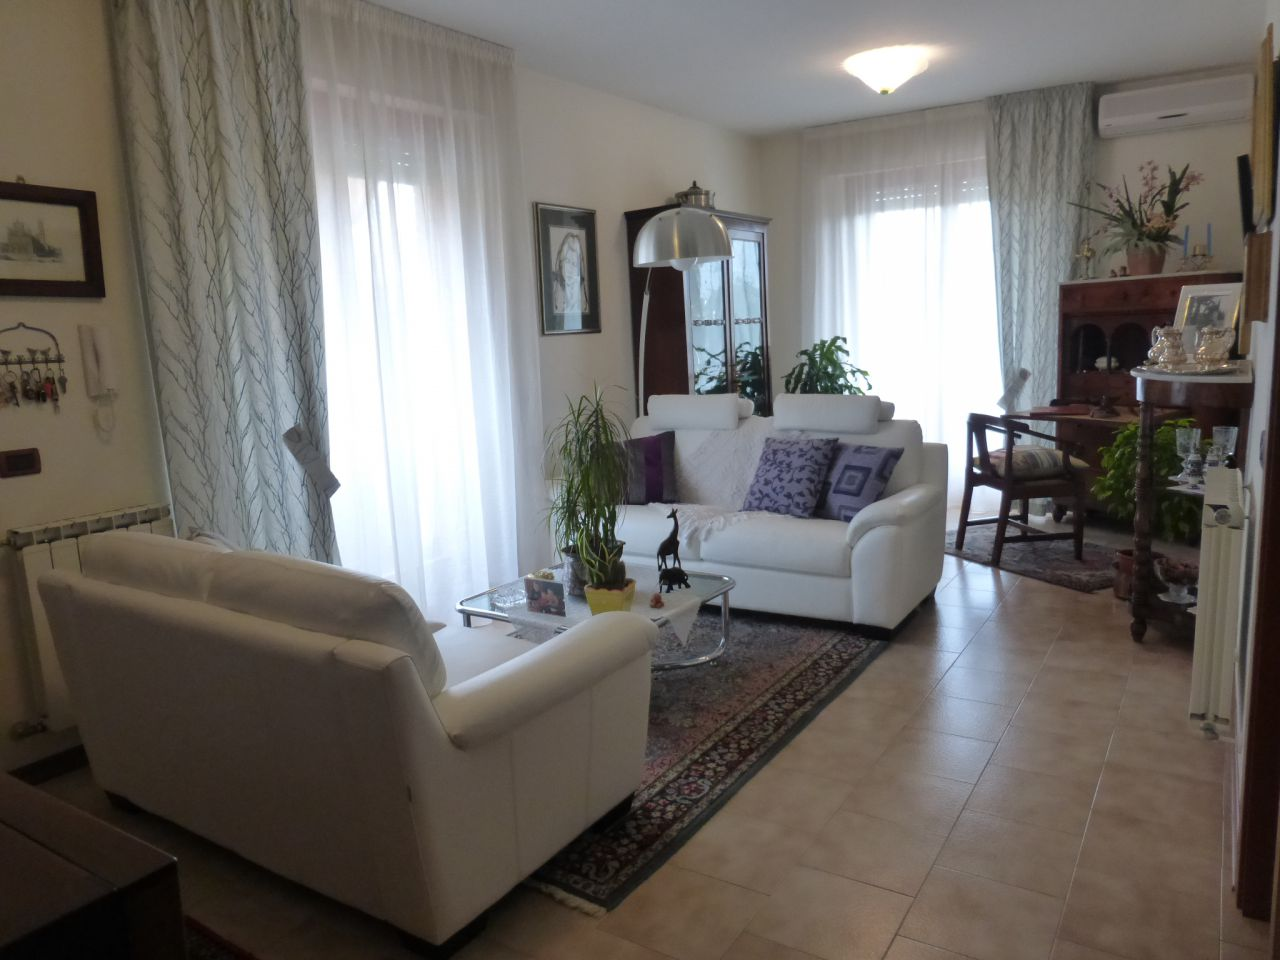 Appartamento, Via della Gabella, Vendita - Siena (Siena)